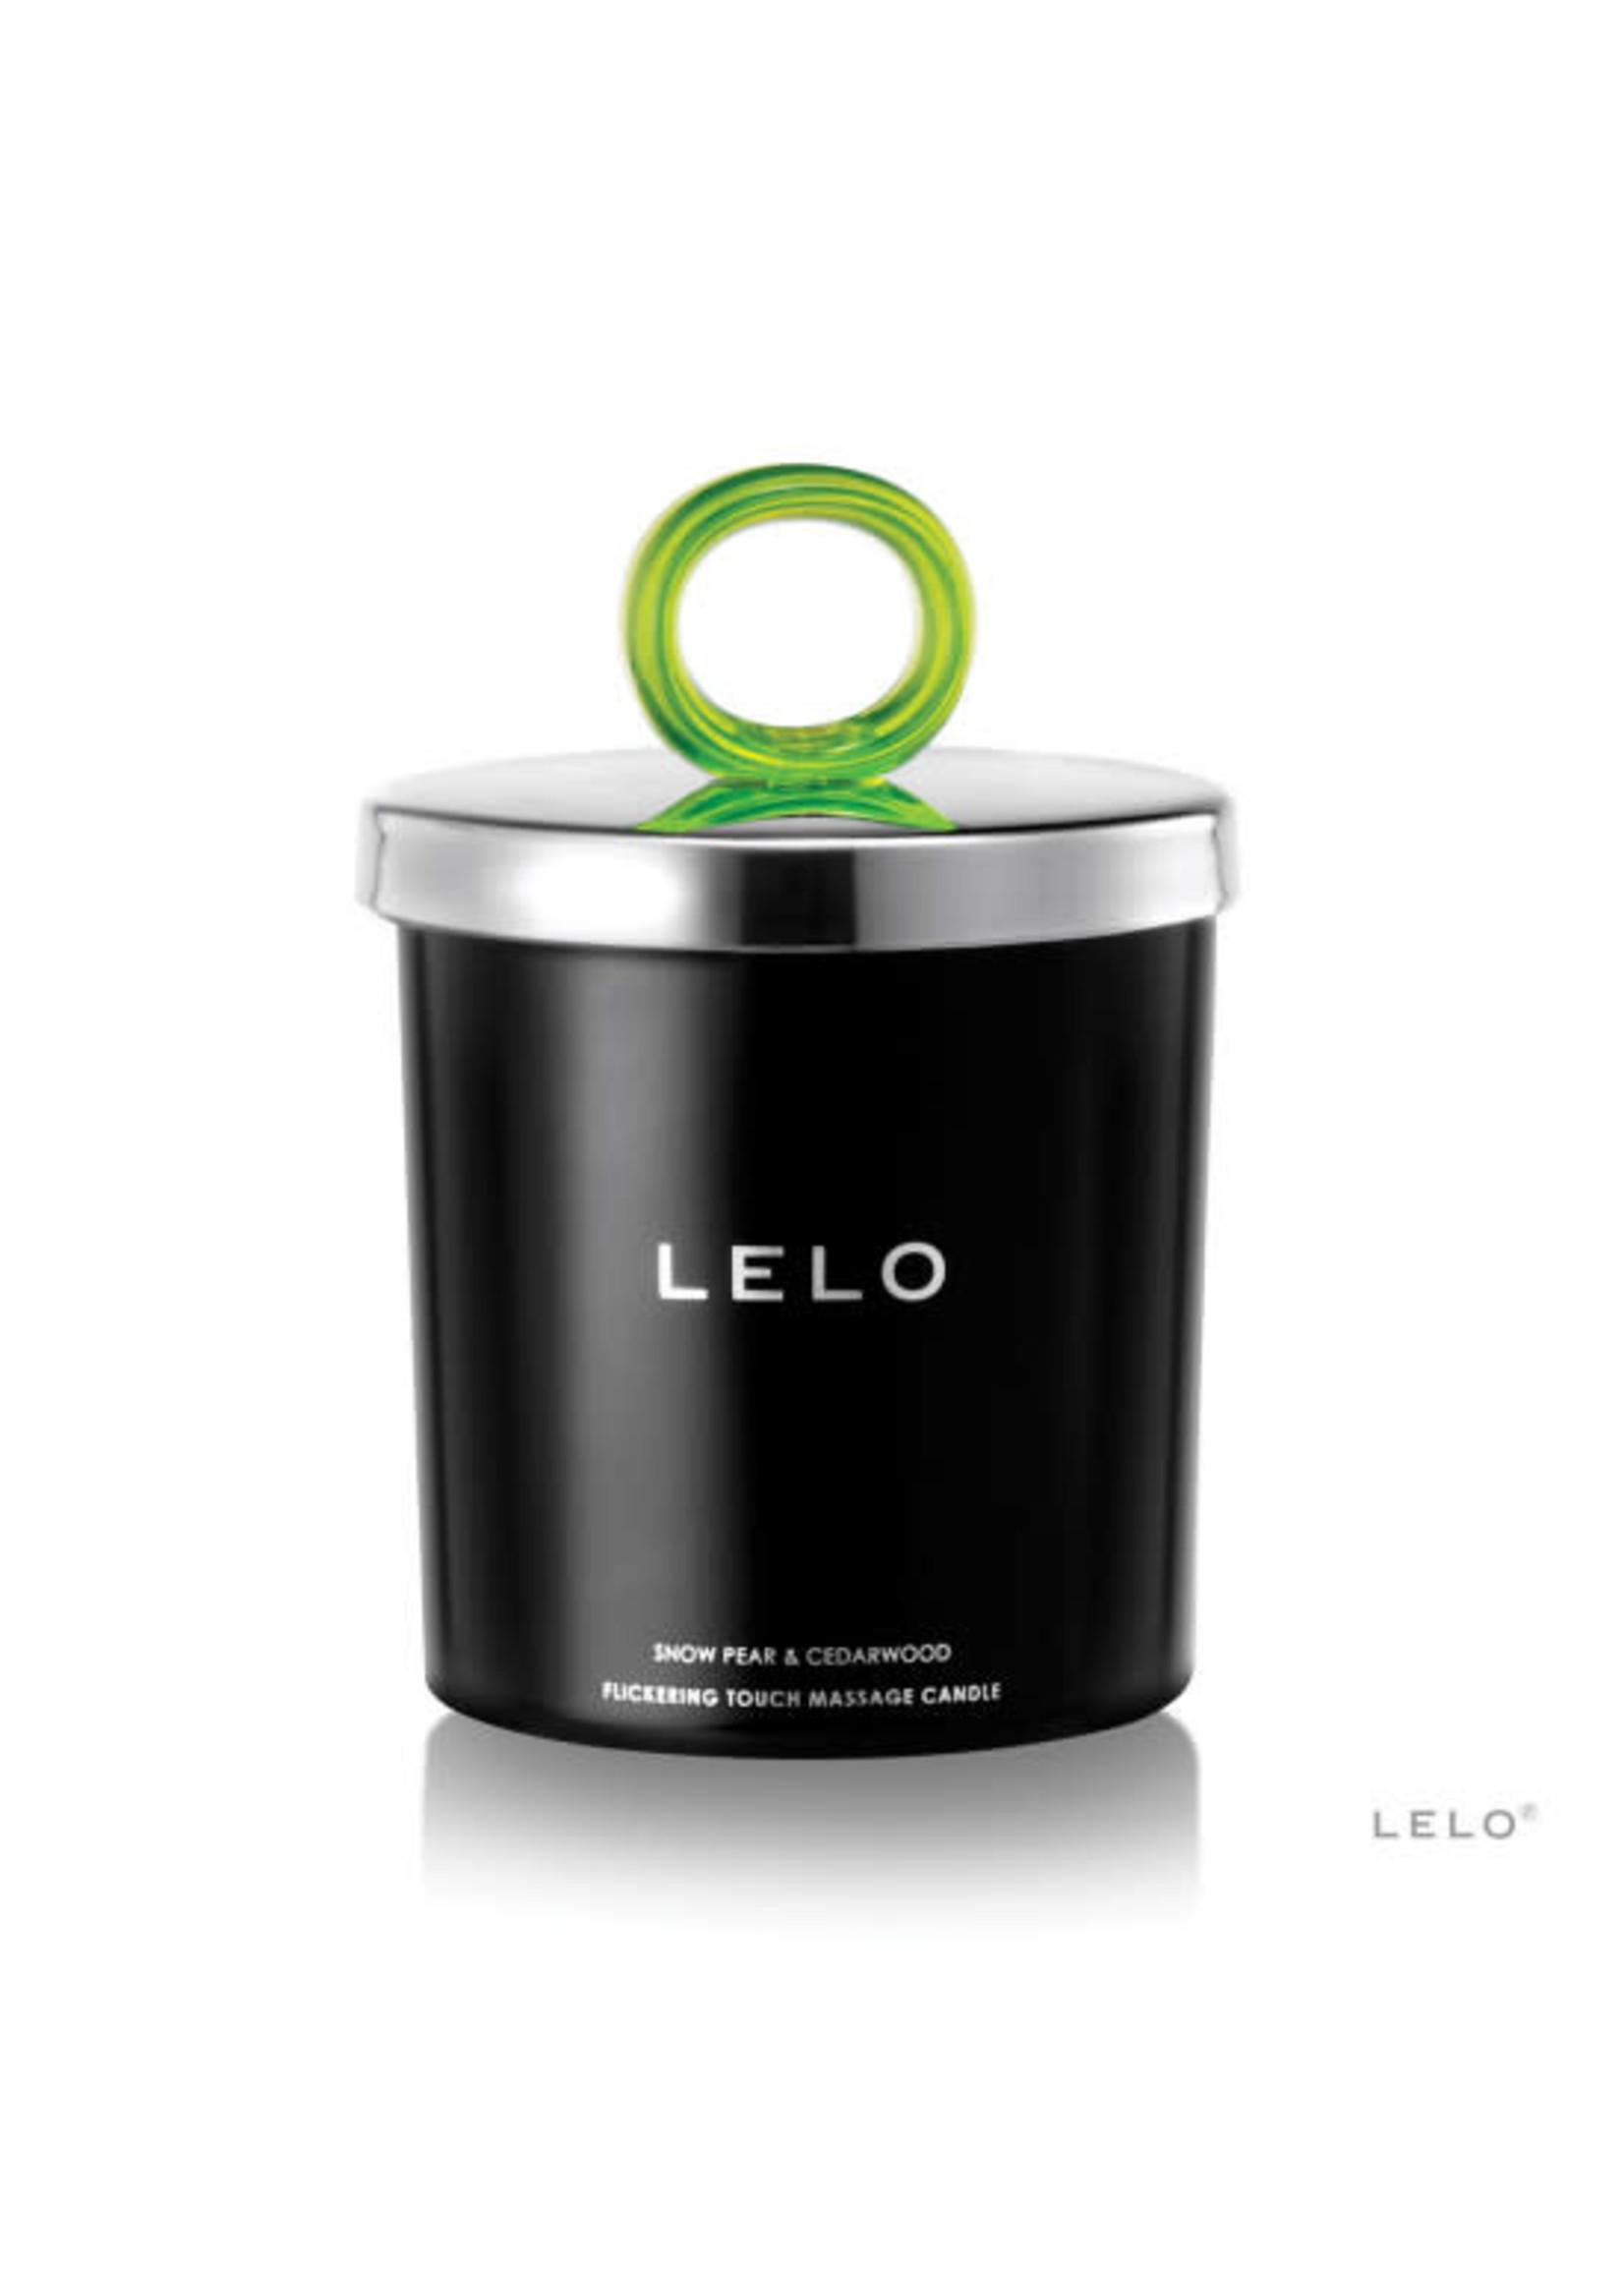 Lelo Snow Pear/Cedarwood LELO Flickering Touch Massage Candle